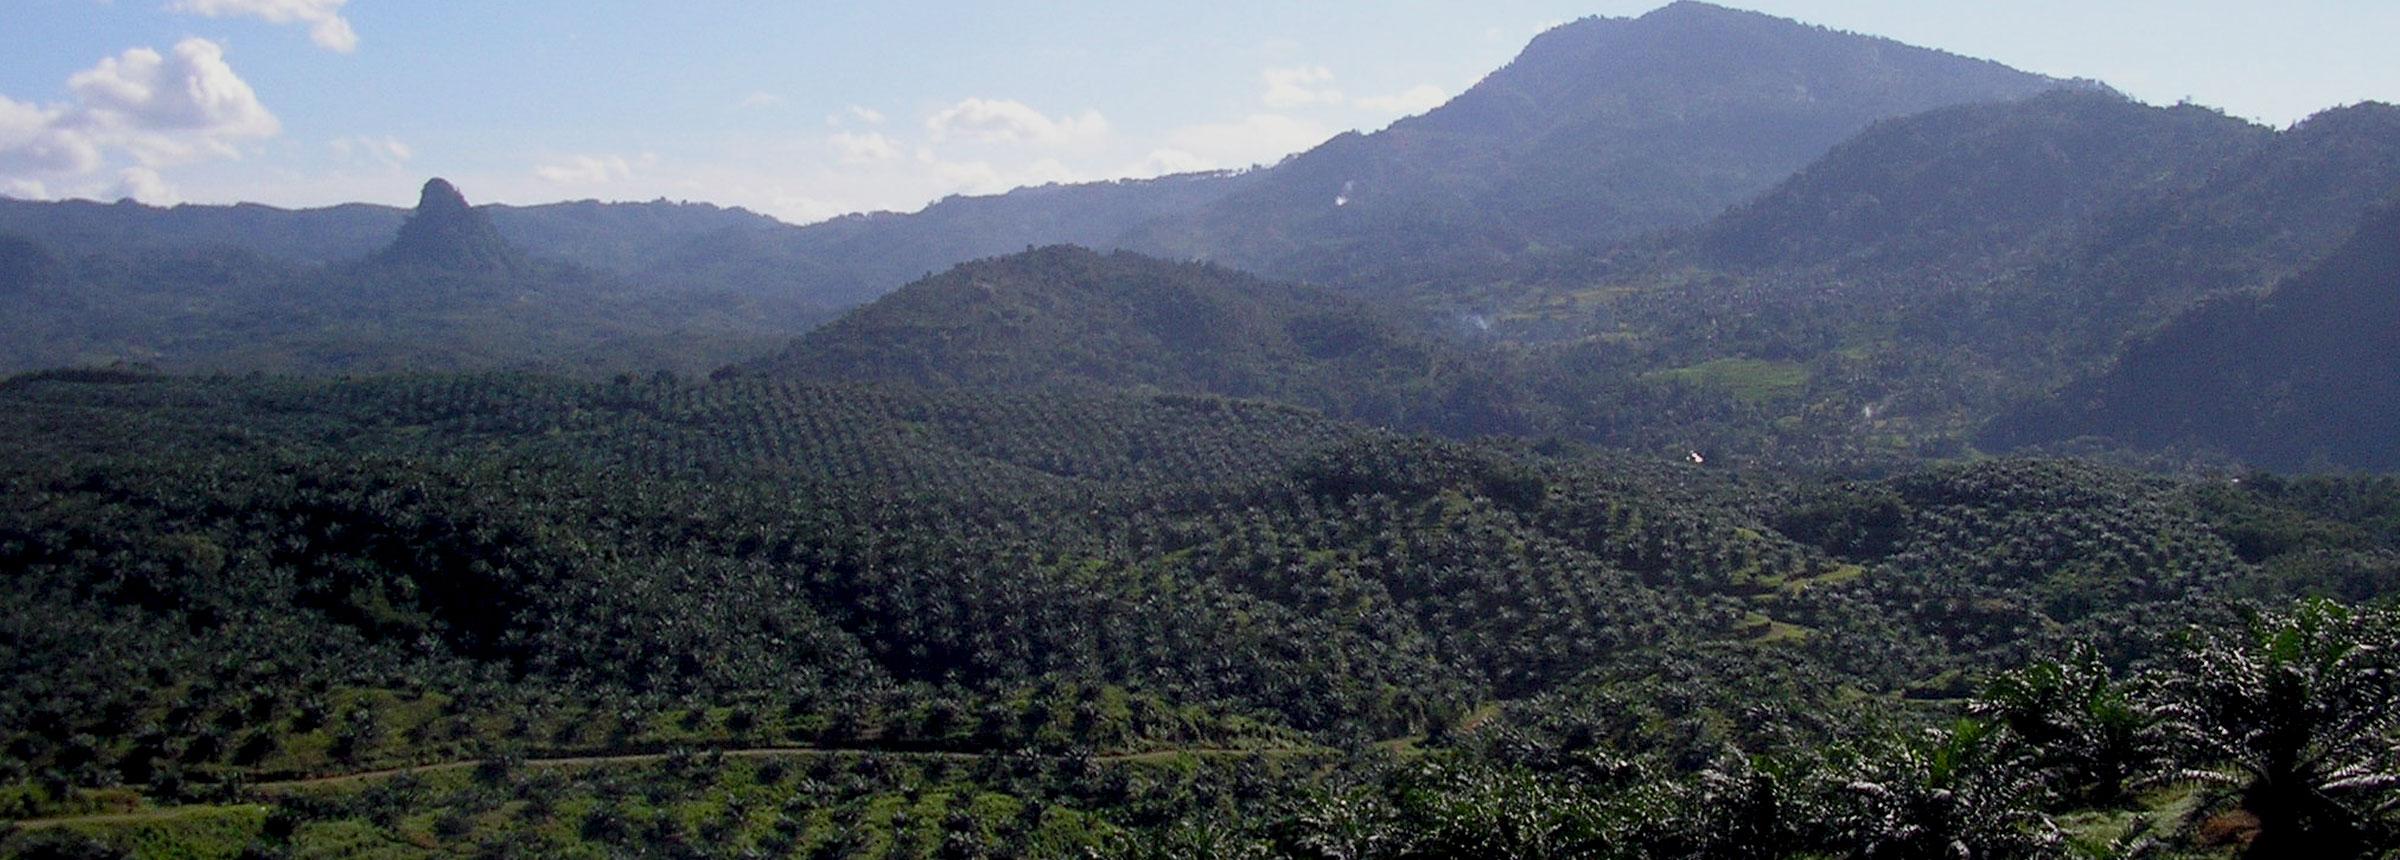 Indonesia landscape